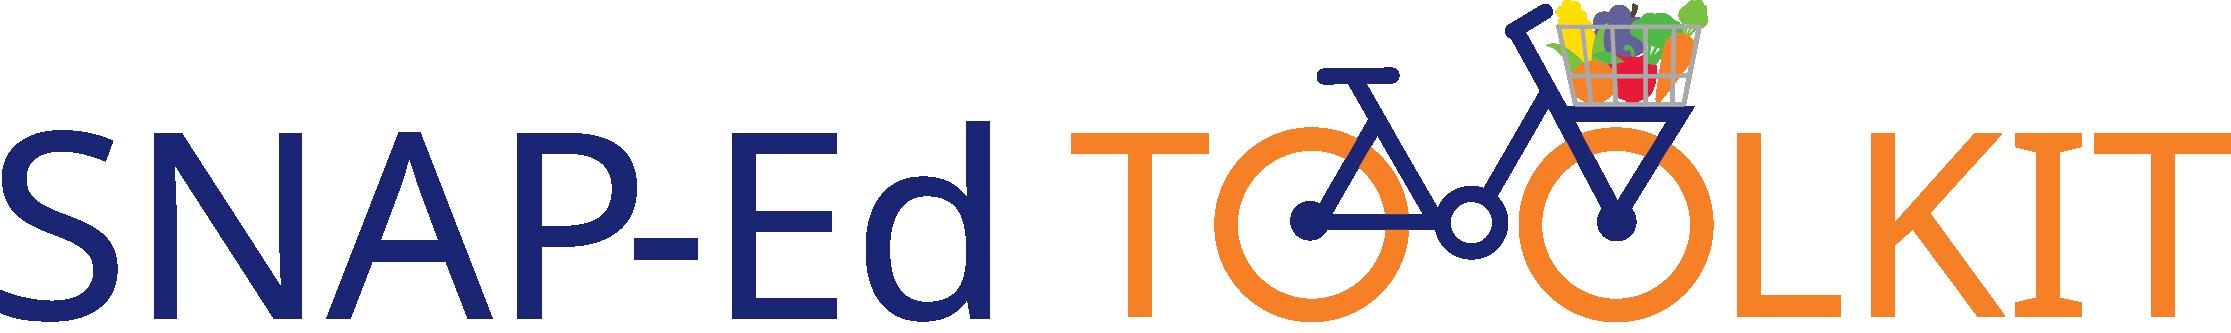 SNAPEd Toolkit logo